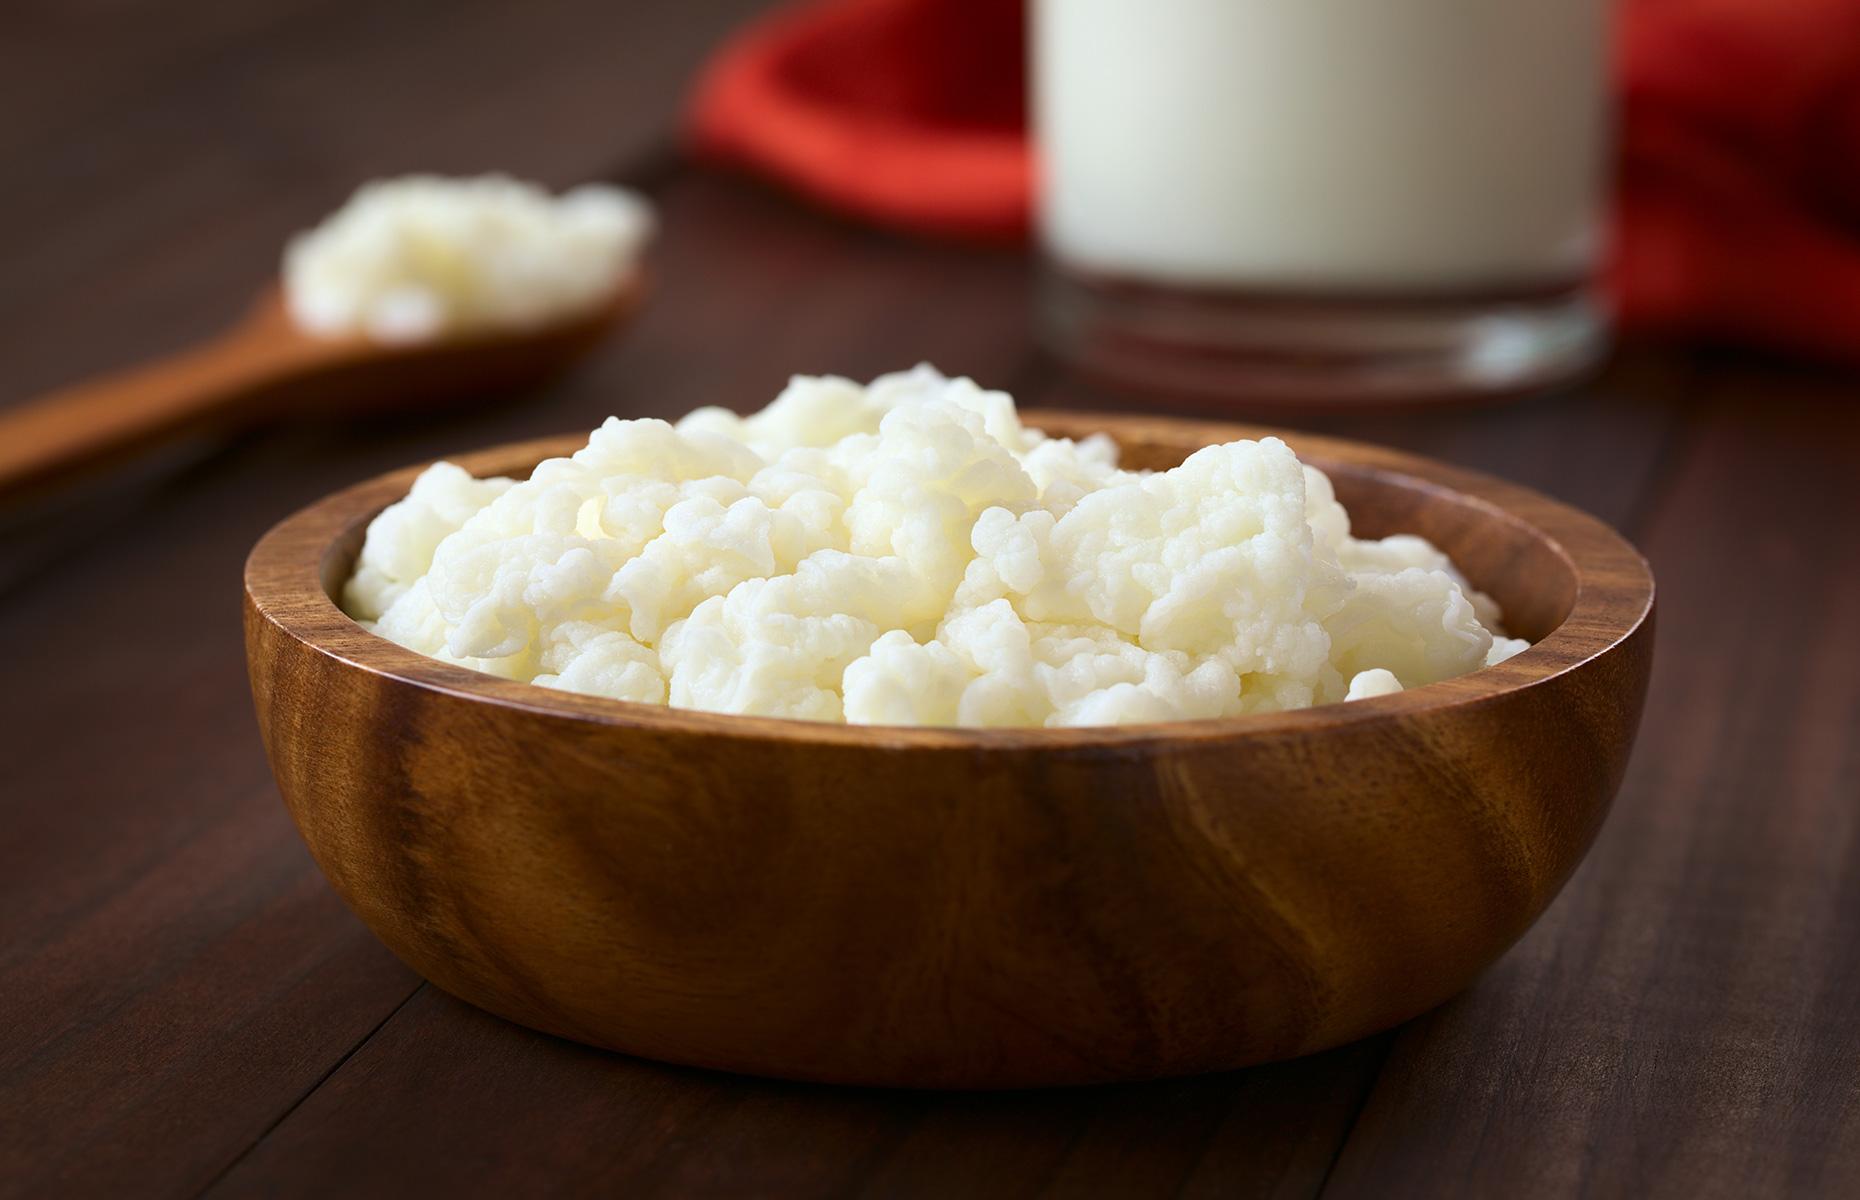 Bowl of kefir grains (Image: Ildi Papp/Shutterstock)